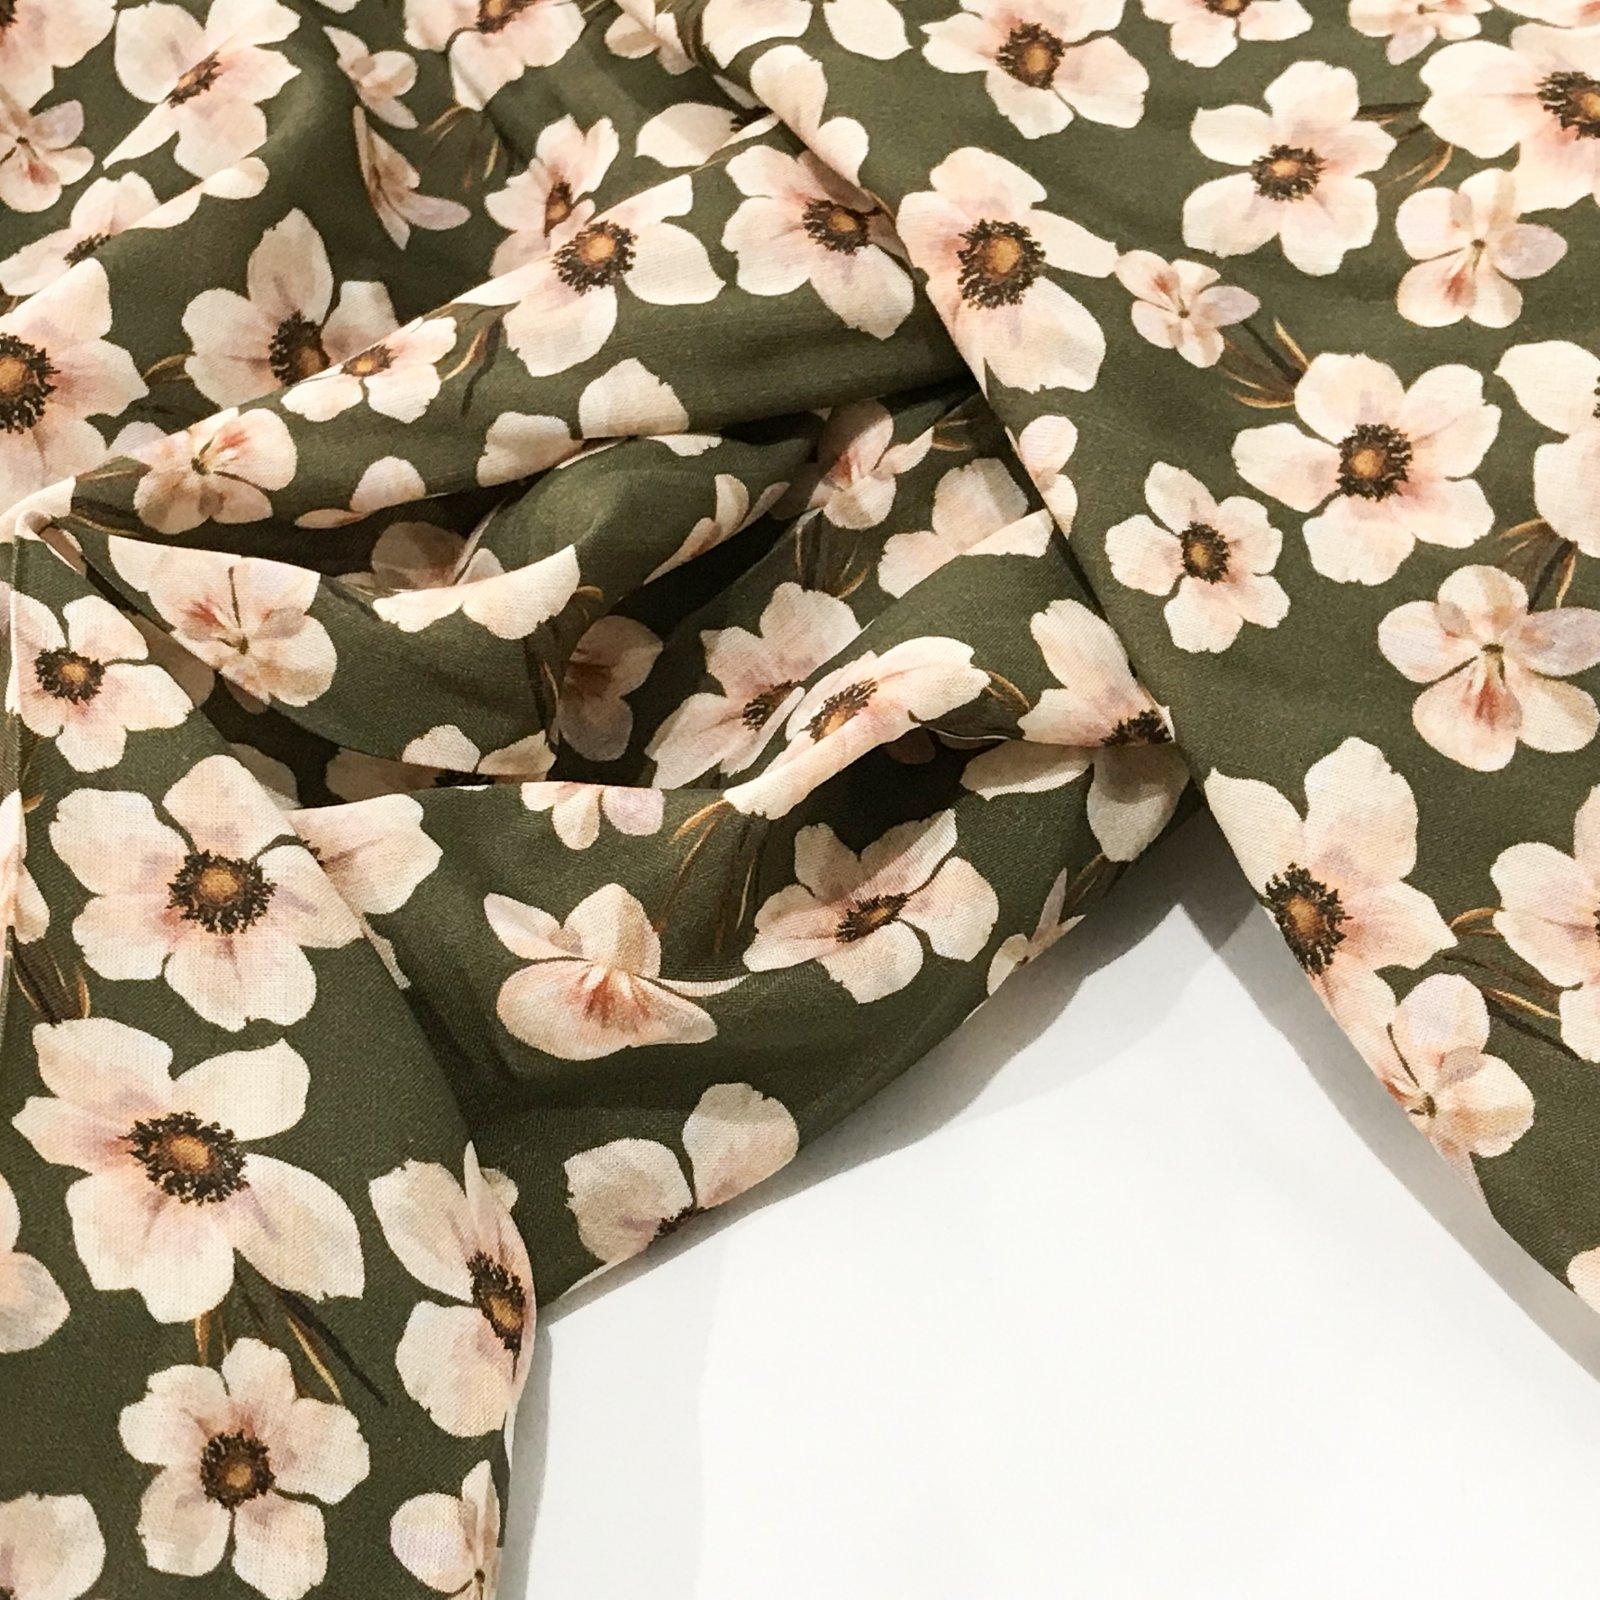 Viscose - Floral Chain - Fern